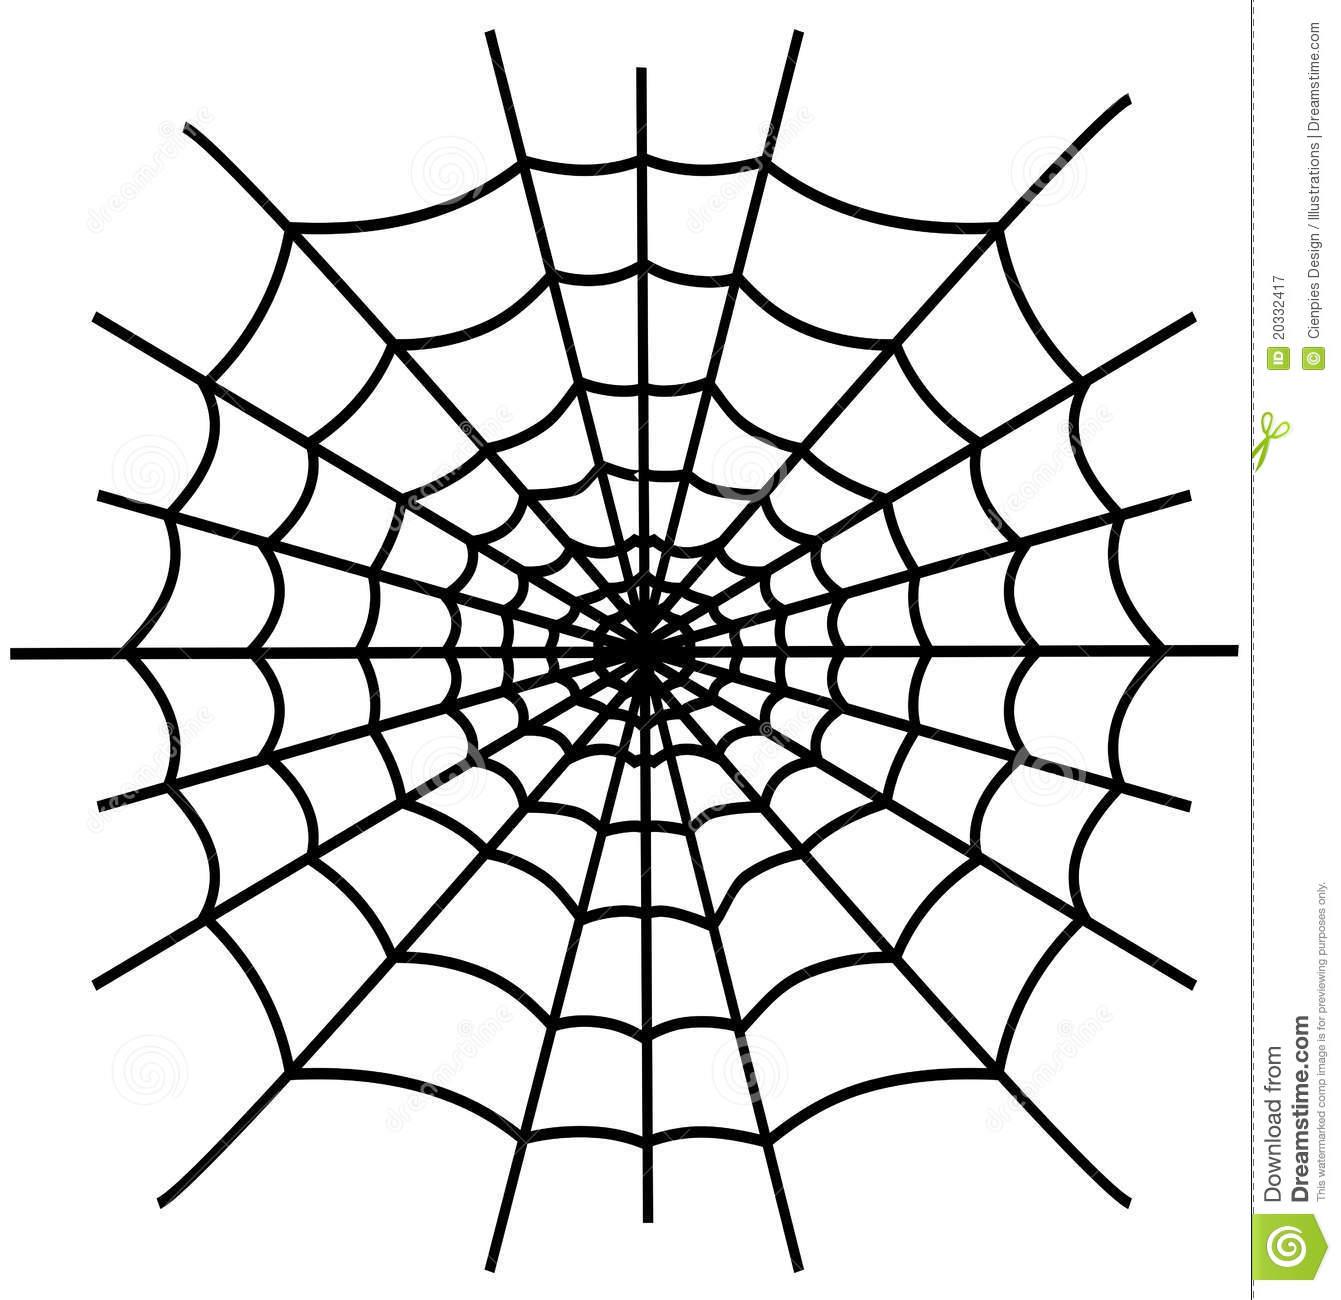 white spider web clip art clipart panda free clipart images rh clipartpanda com halloween clipart spider web clipart images of spider webs